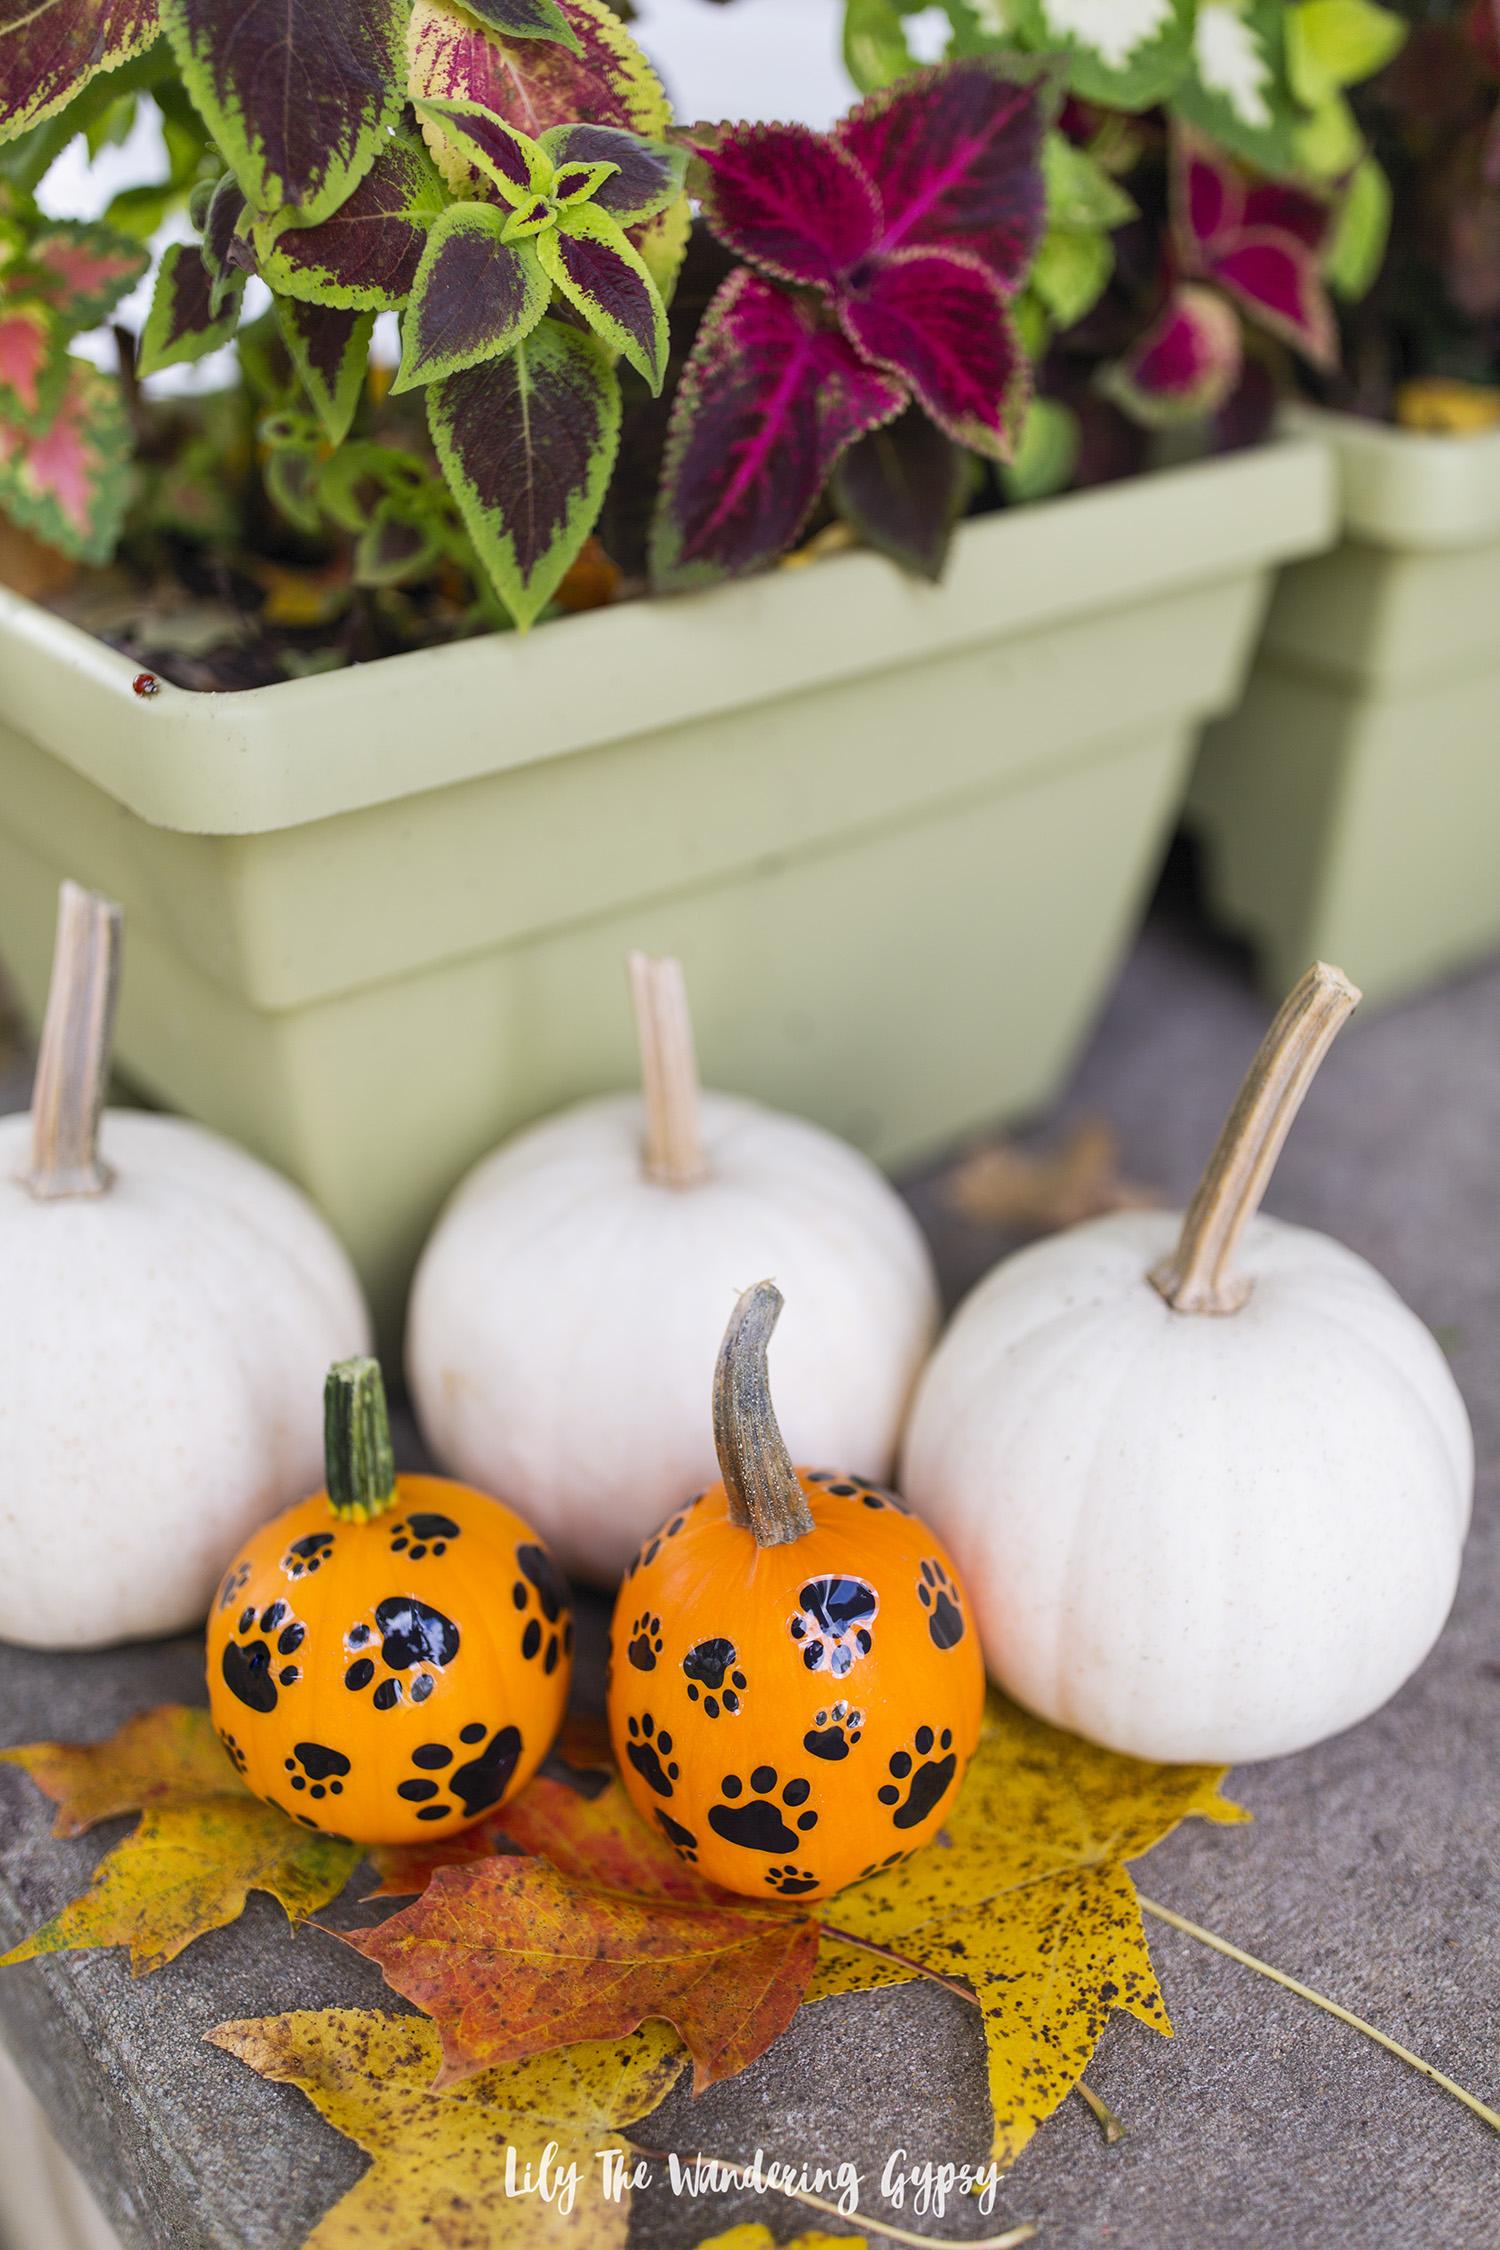 DIY Pumpkins For Dogs